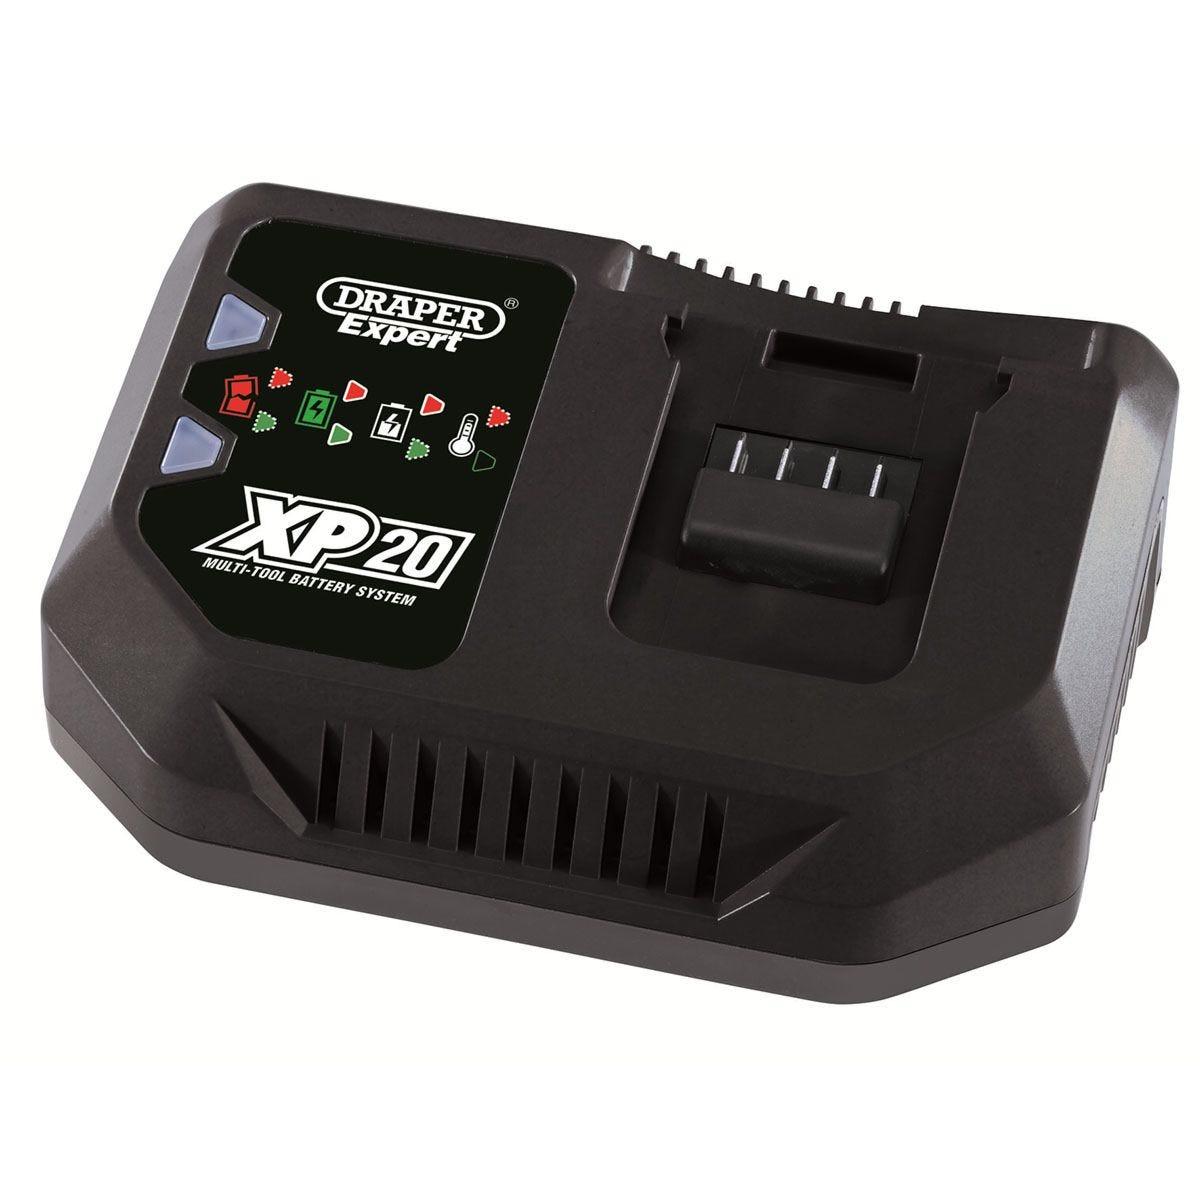 Draper XP20 20V Fast Battery Charger